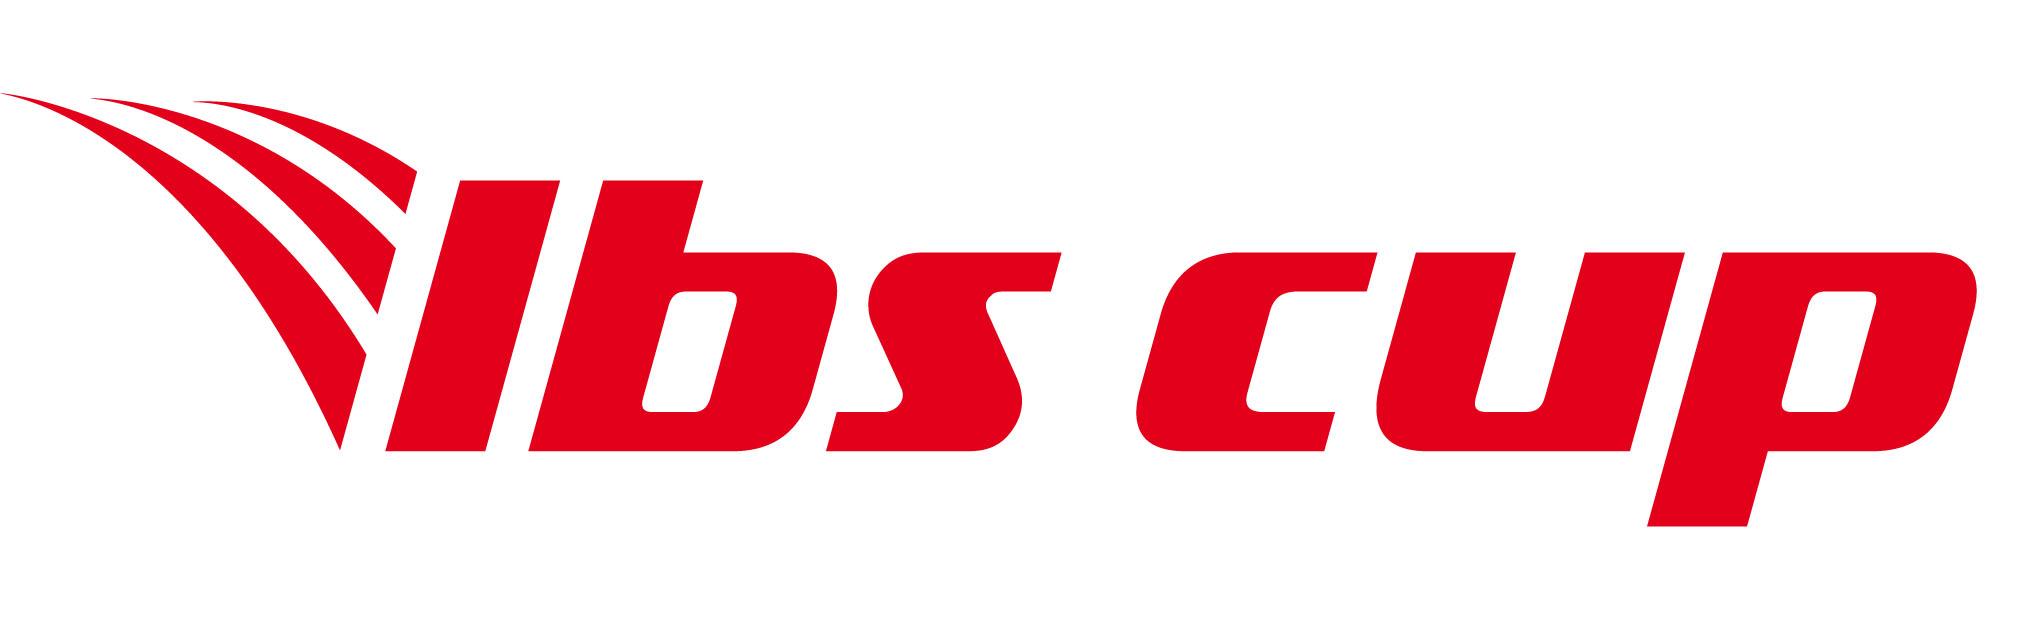 logo_lbscup_cmyk-jpg